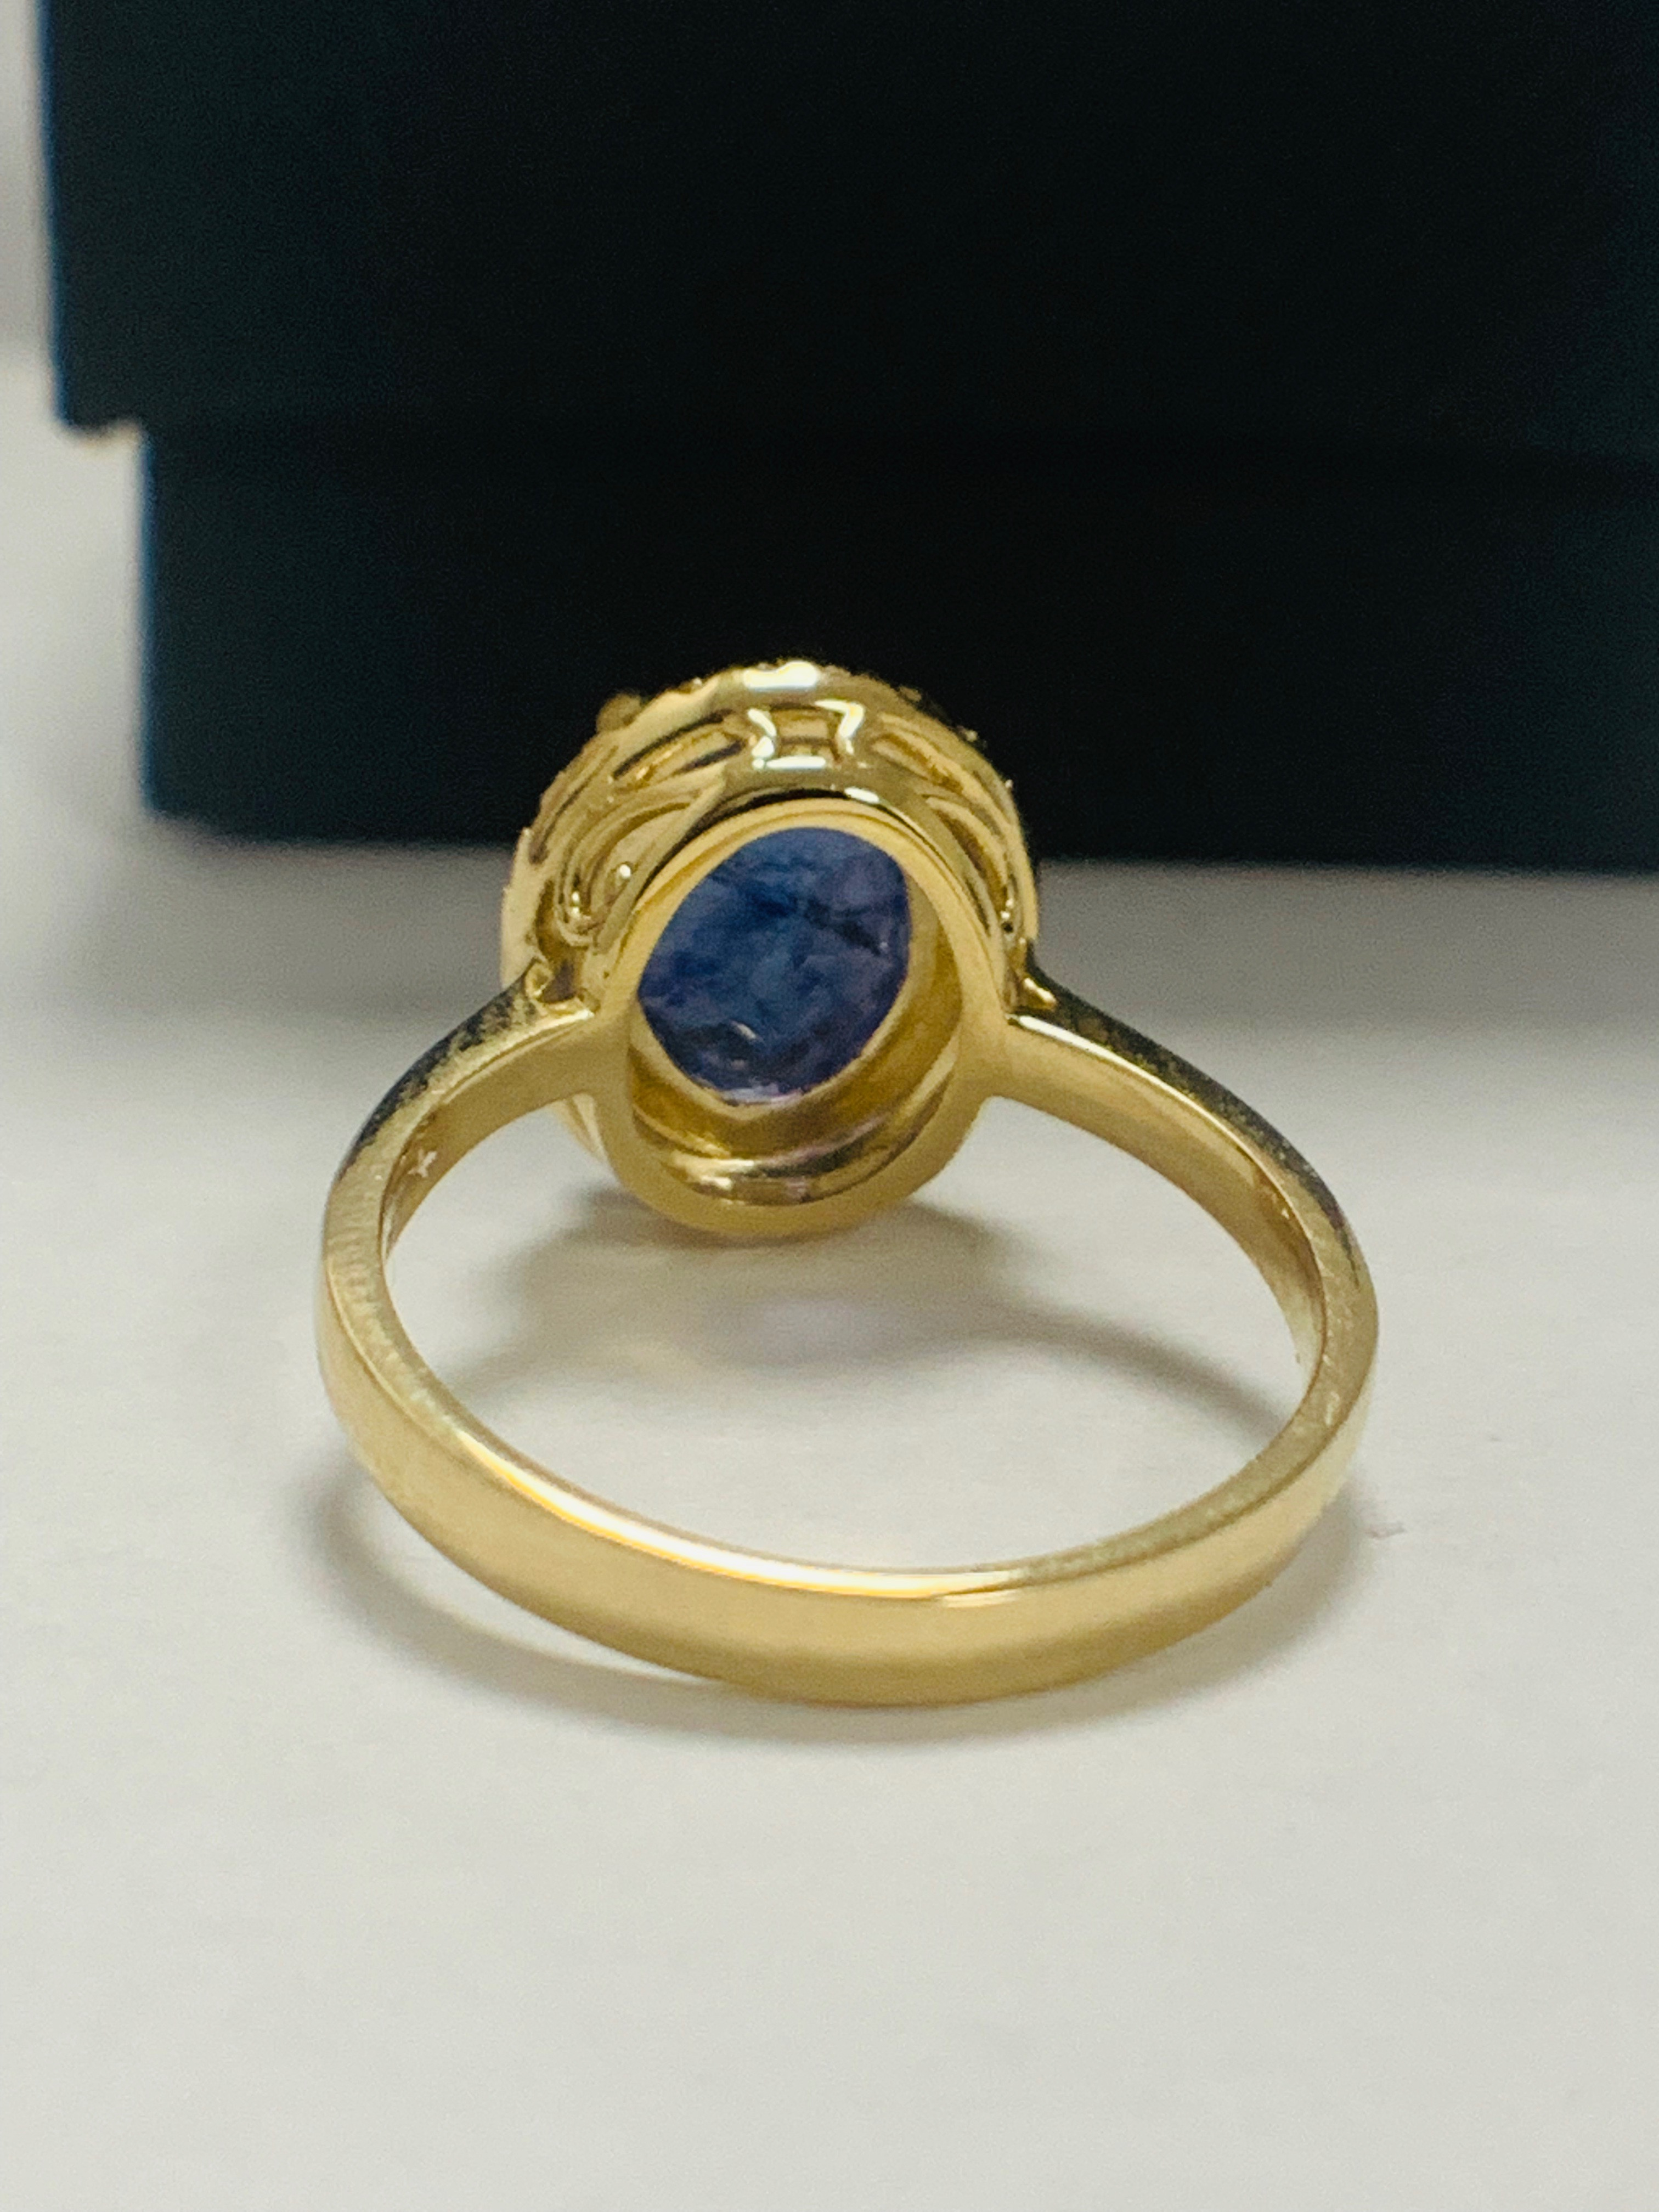 14ct Yellow Gold Tanzanite and Diamond ring - Image 6 of 13